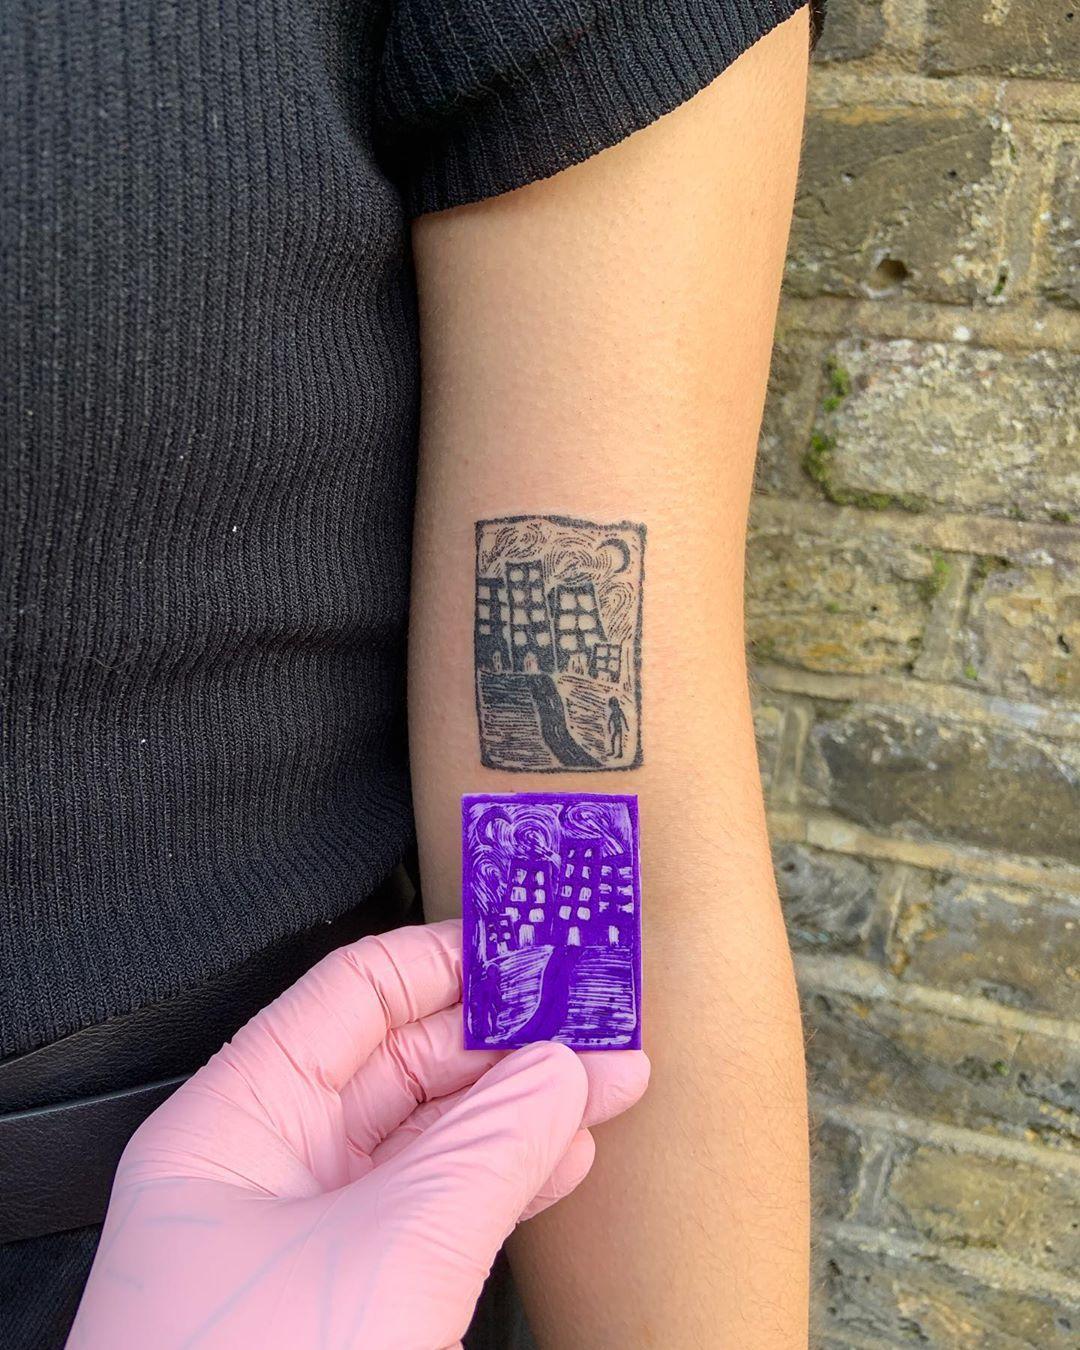 "Photo of @lou_isnt shared a photo on Instagram: ""custom city scape for Sophia . . . . . . #stickandpoke #handpoke  #handpoketattoo #homemadetattoo  #ignorantstyletattoo #tattoo #tttism…"" • Feb 10, 2020 at 11:49am UTC"